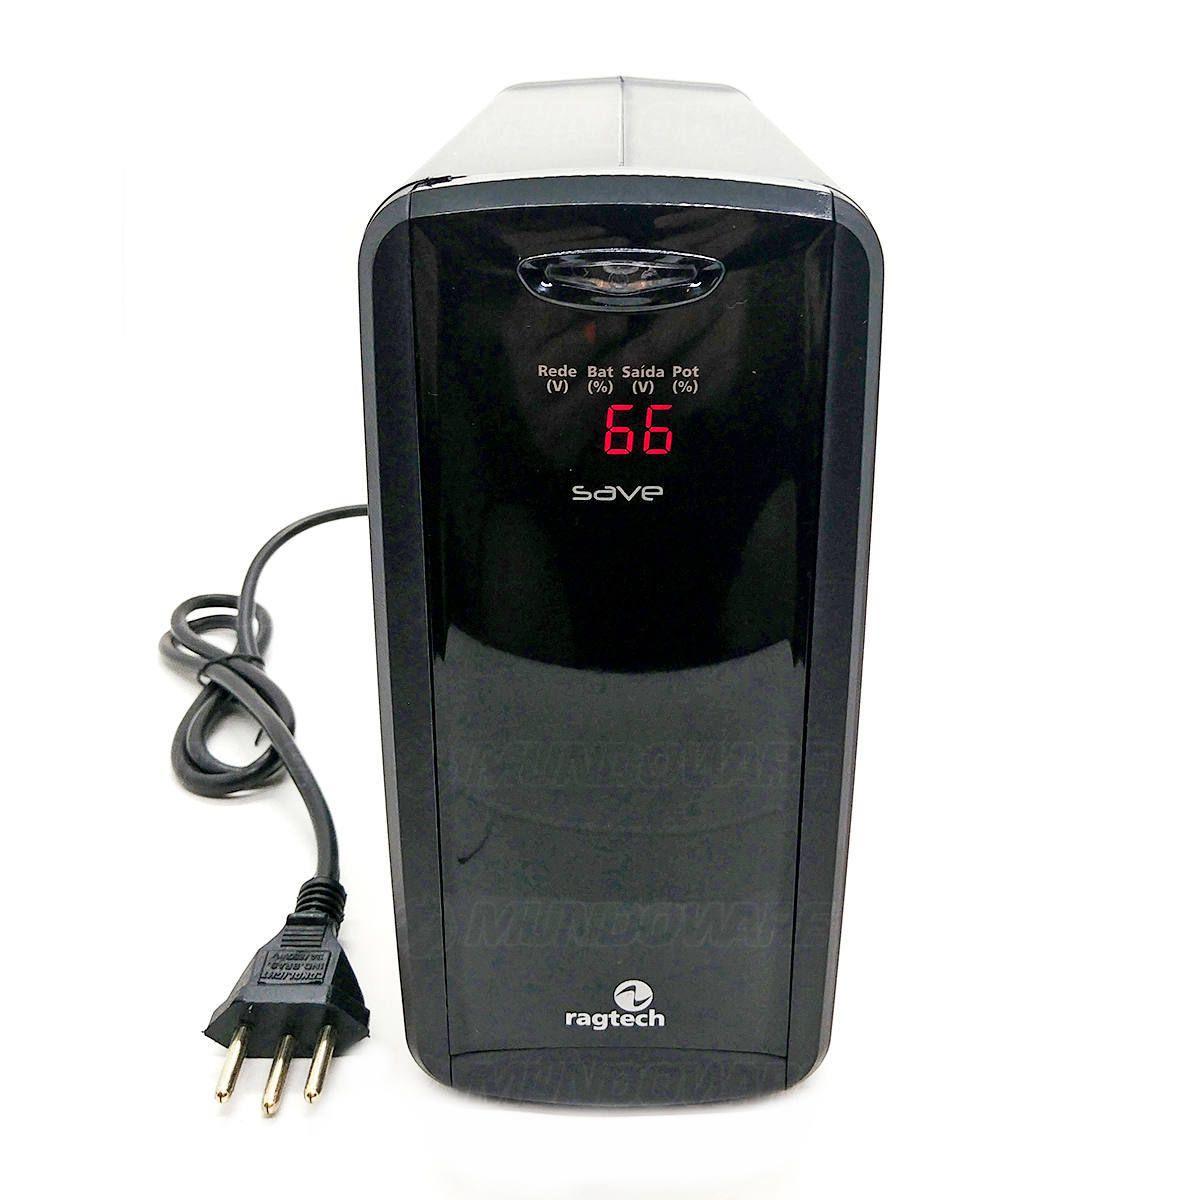 Nobreak 600VA 300W Display Digital 6 Tomadas 3 em 1 Troca Fácil de Bateria Trivolt PWM Ragtech Save Home DIG/STD-TI 4129